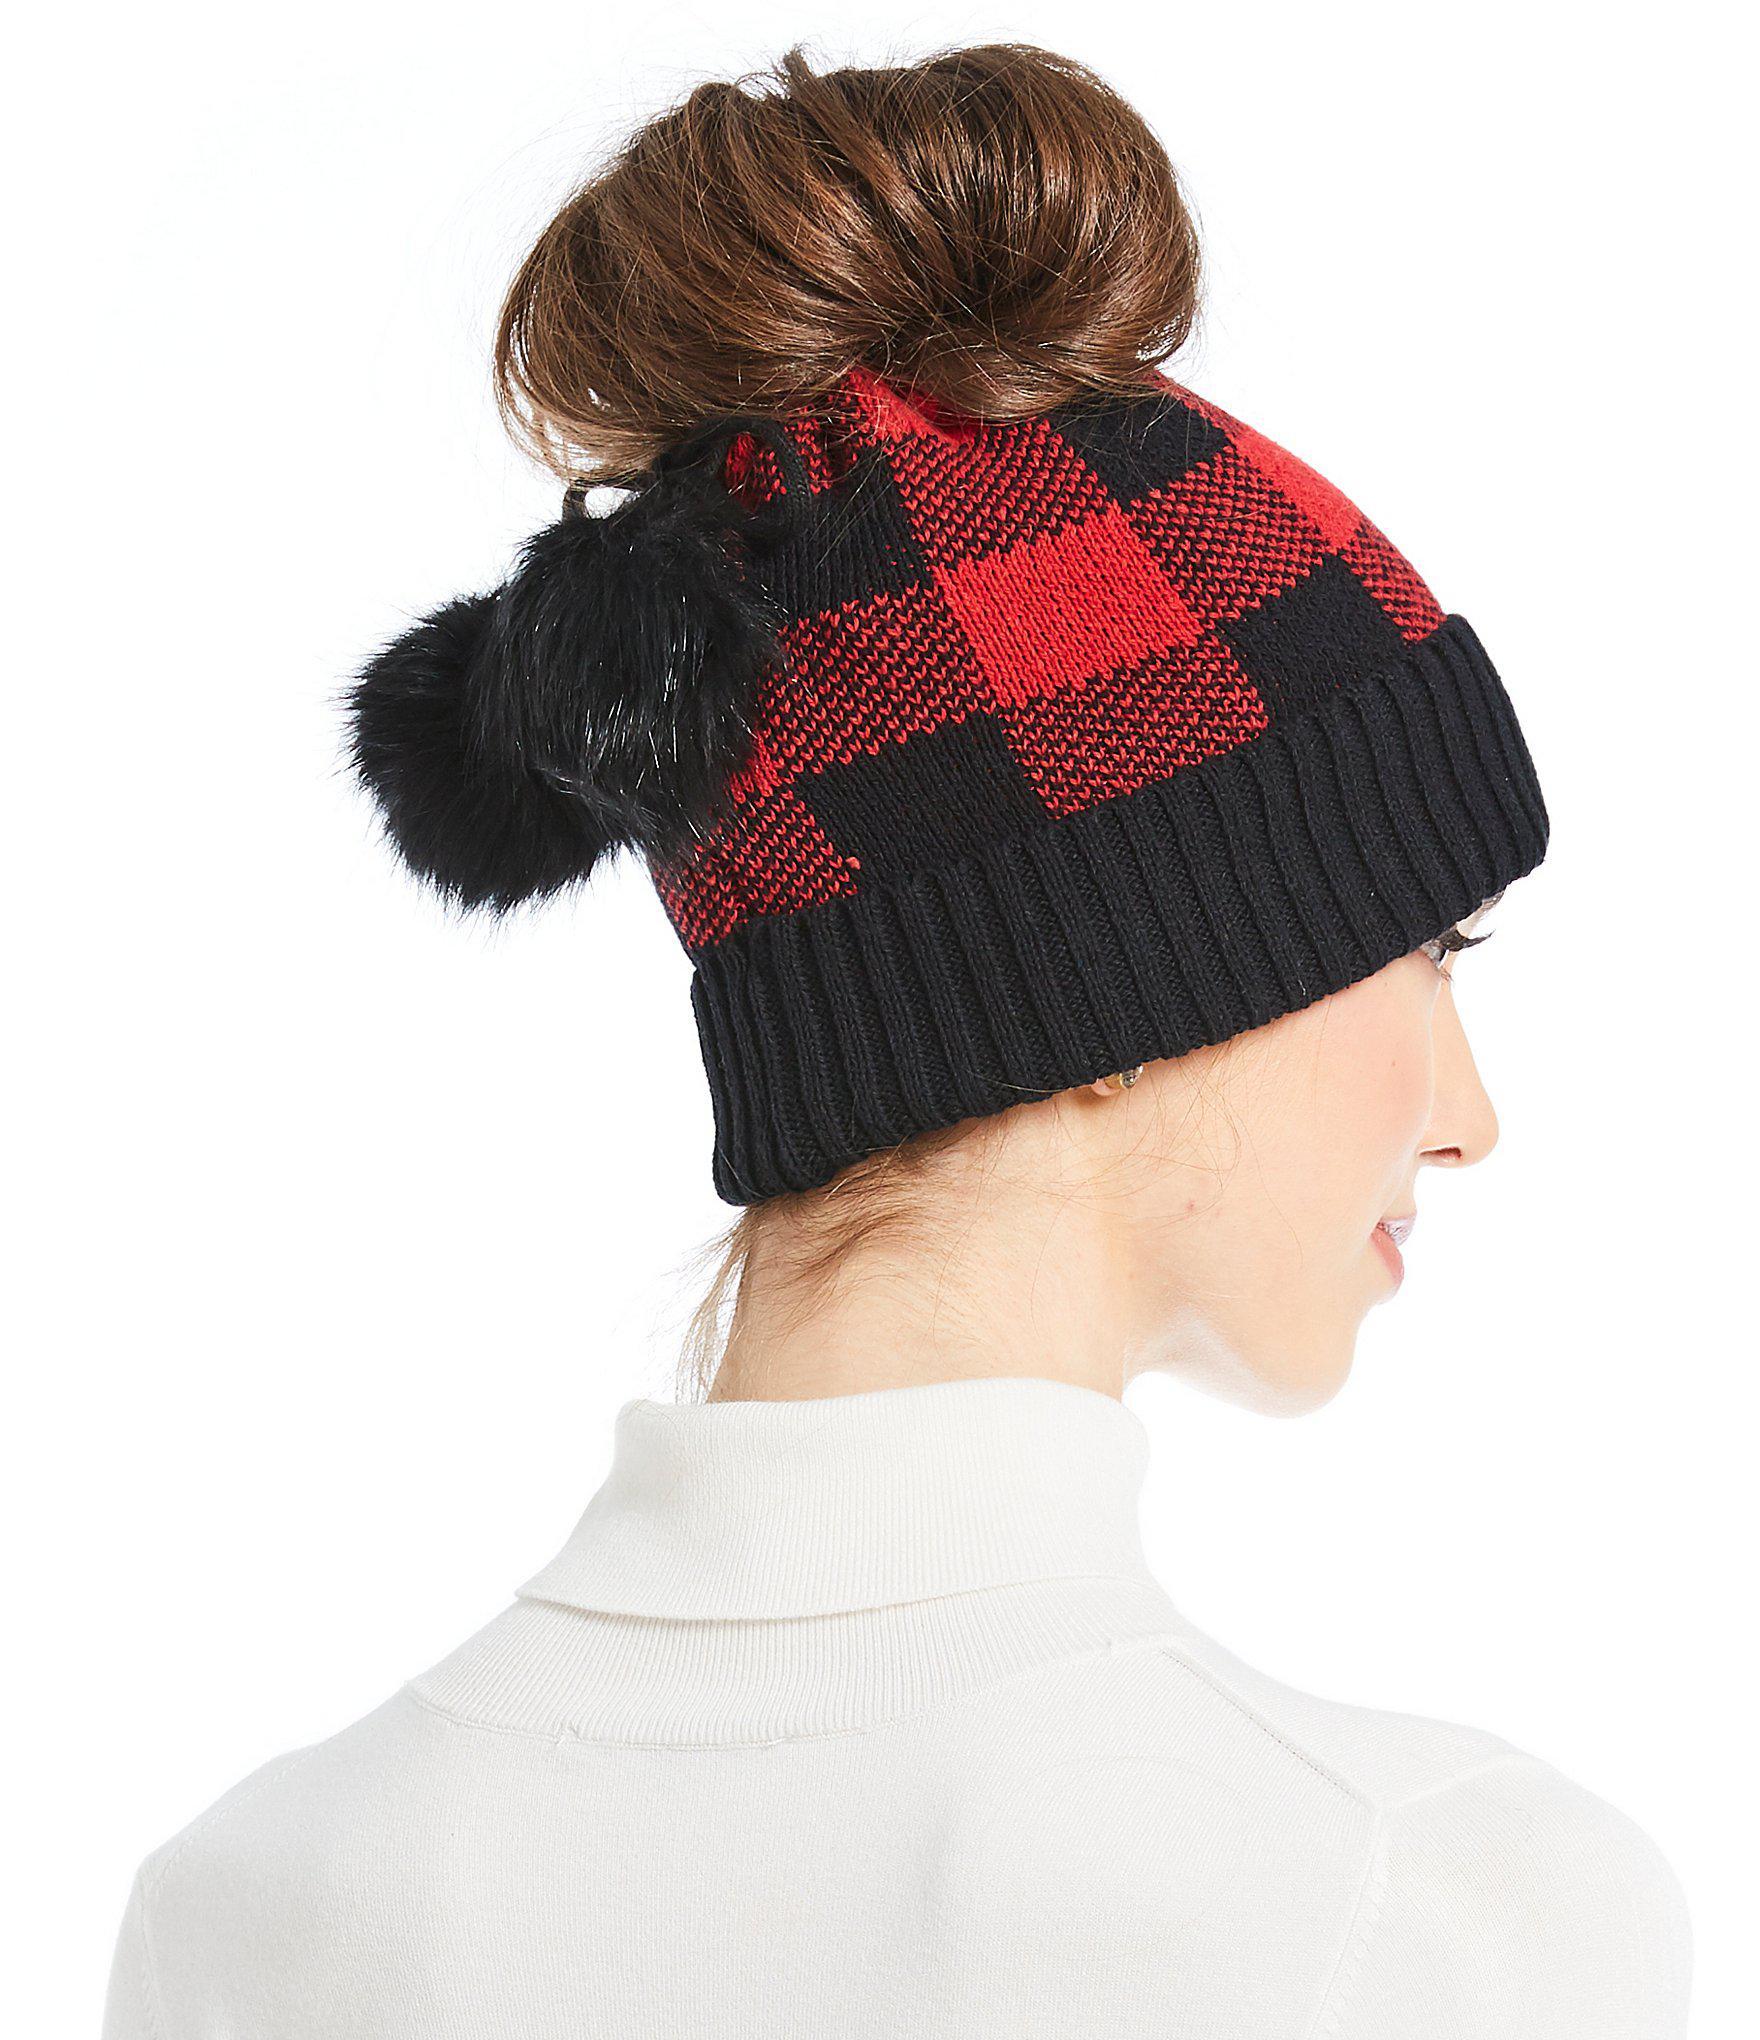 9b0e9cb0ed6 Lyst - Parkhurst Ladies  Check Messy-bun Pom Hat